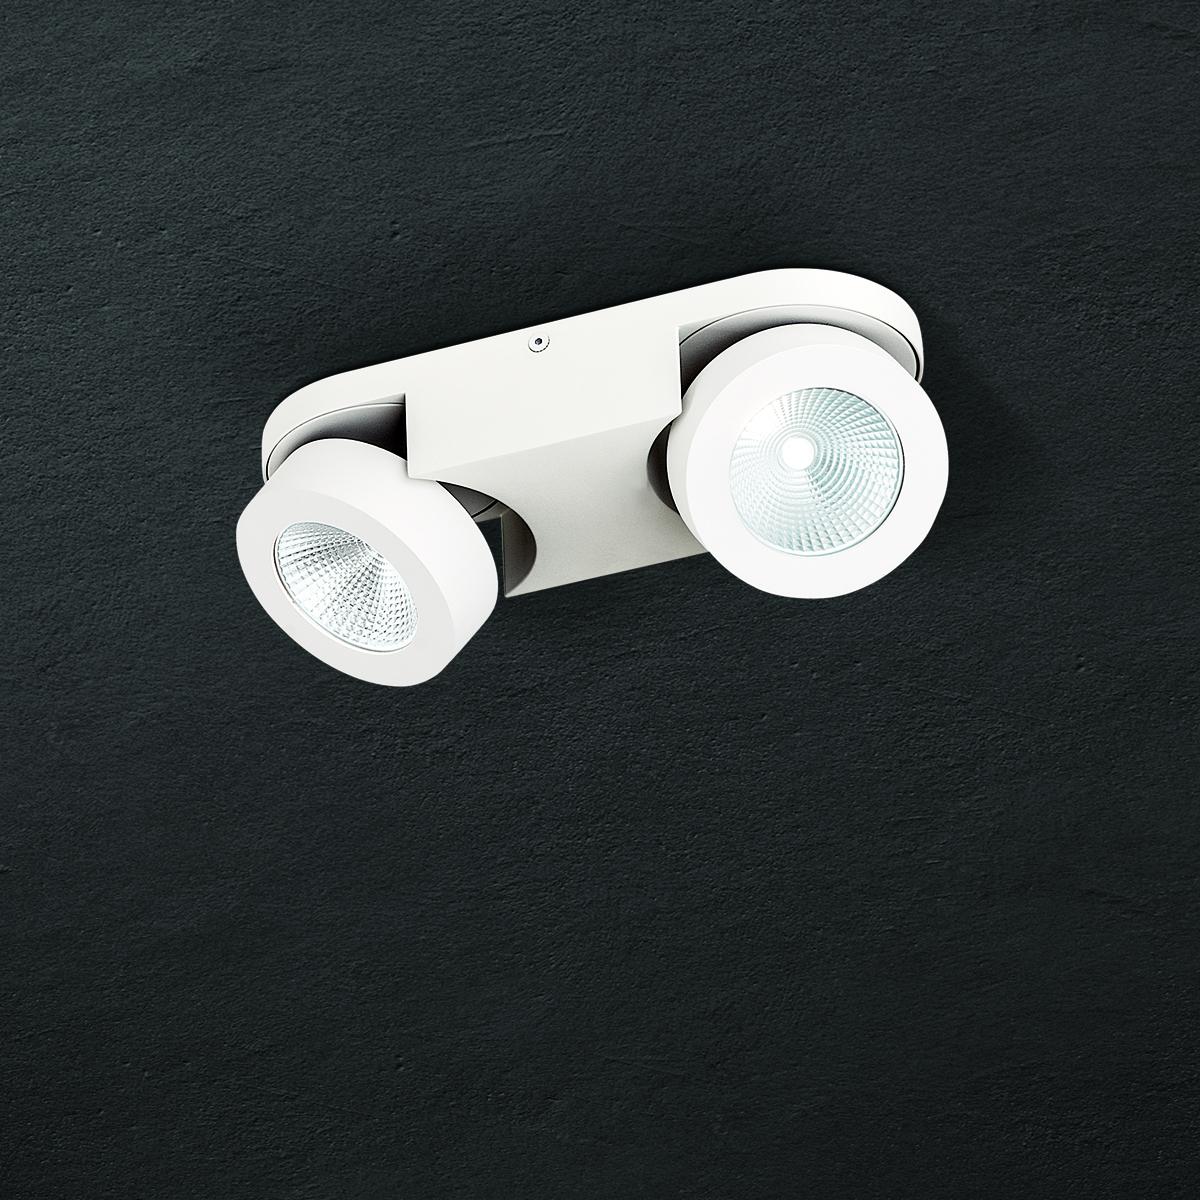 Hausmarke 2er LED-Spot MENO weiß Str 10-467/2 weiß